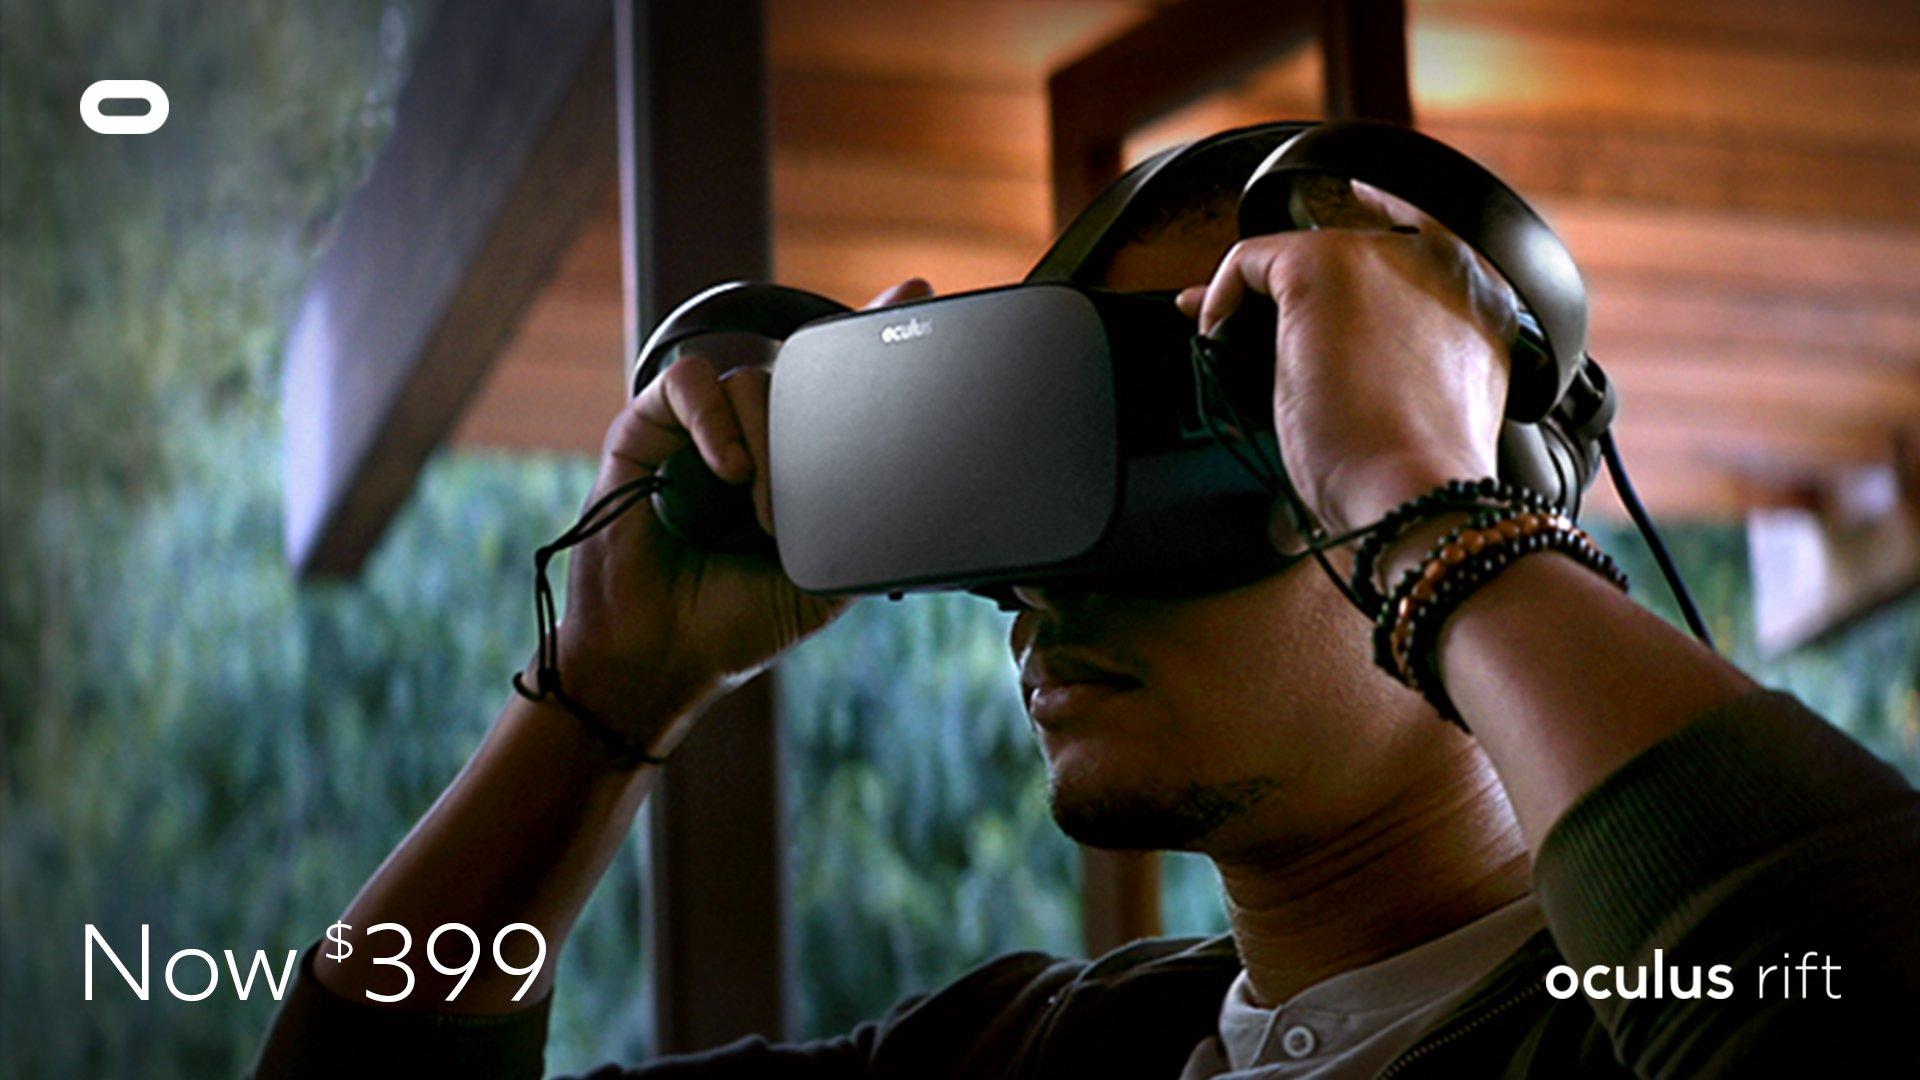 oculus rift price 399